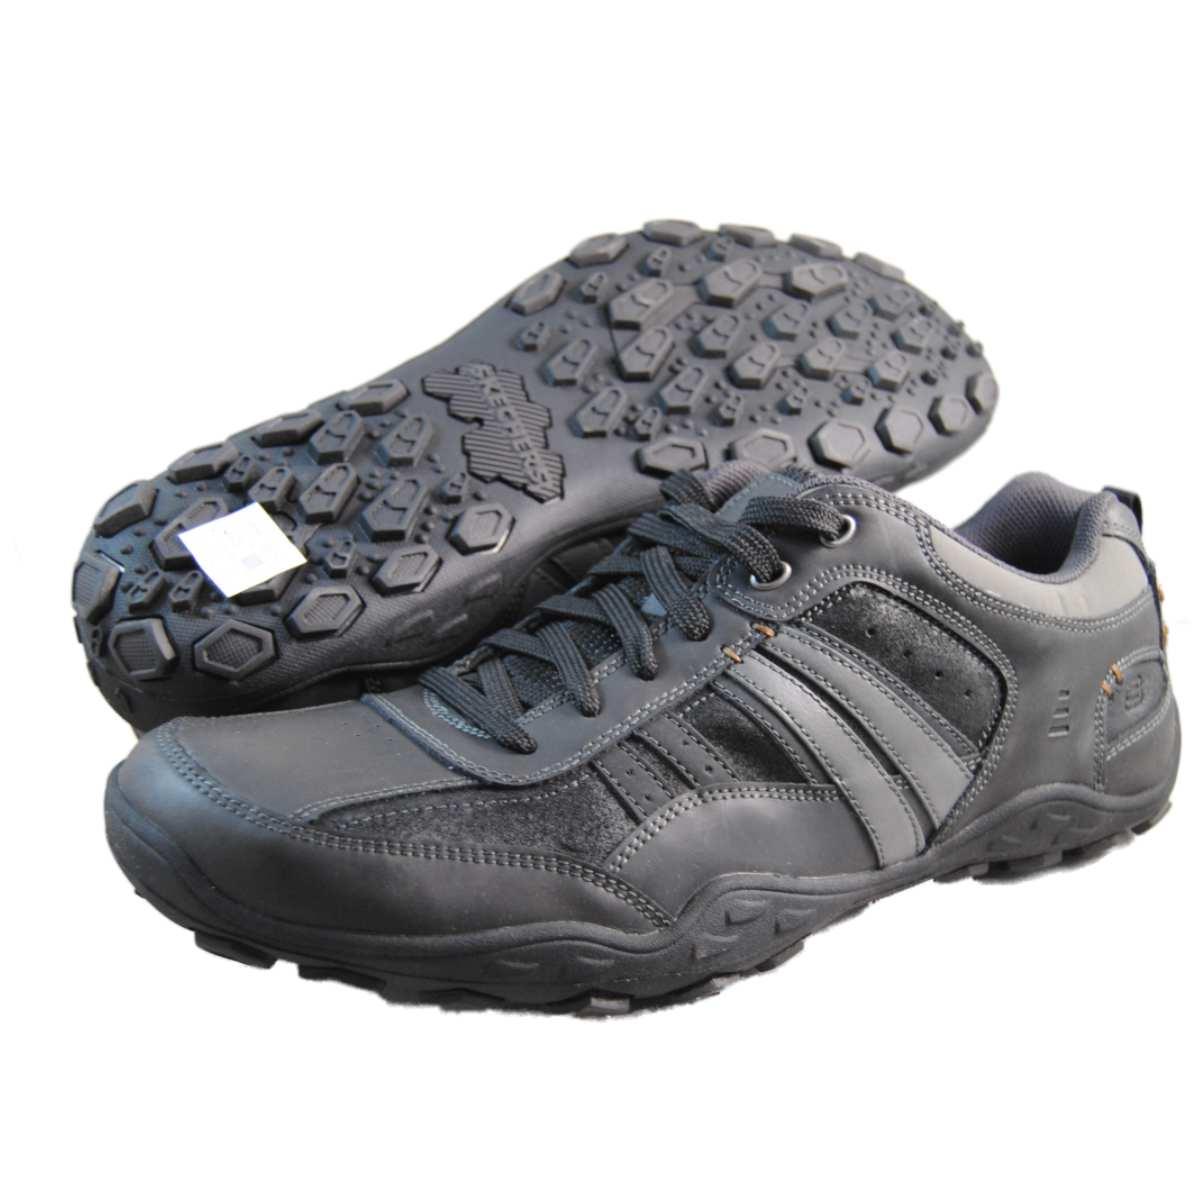 skechers mens pebble galeno black walking shoes 63405 blk